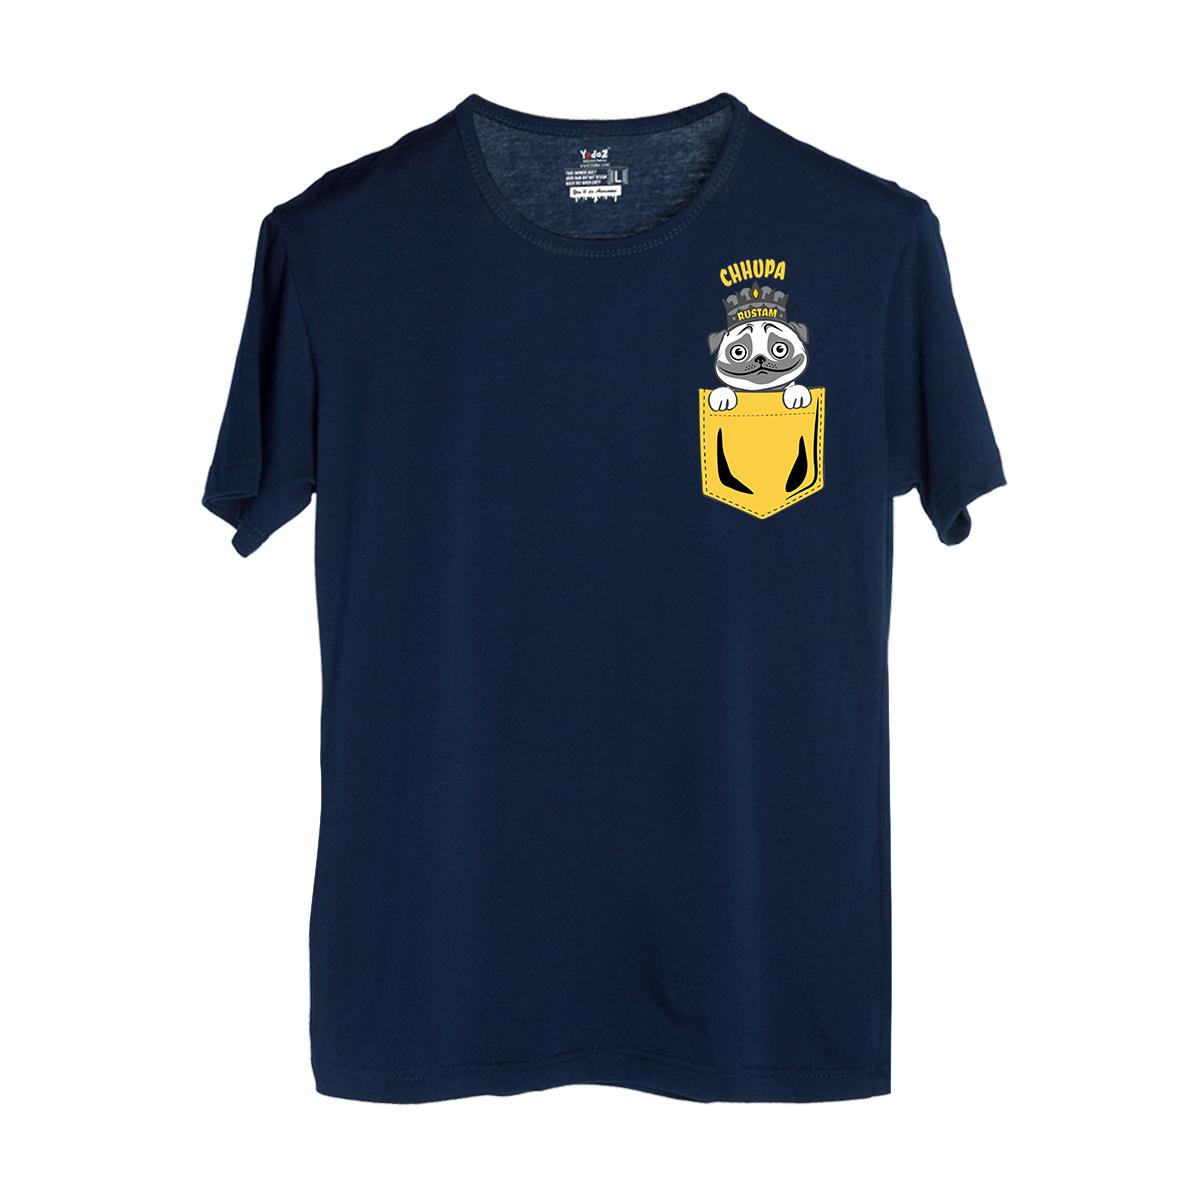 Chhupa Rustom - Men's Trendy T-Shirts